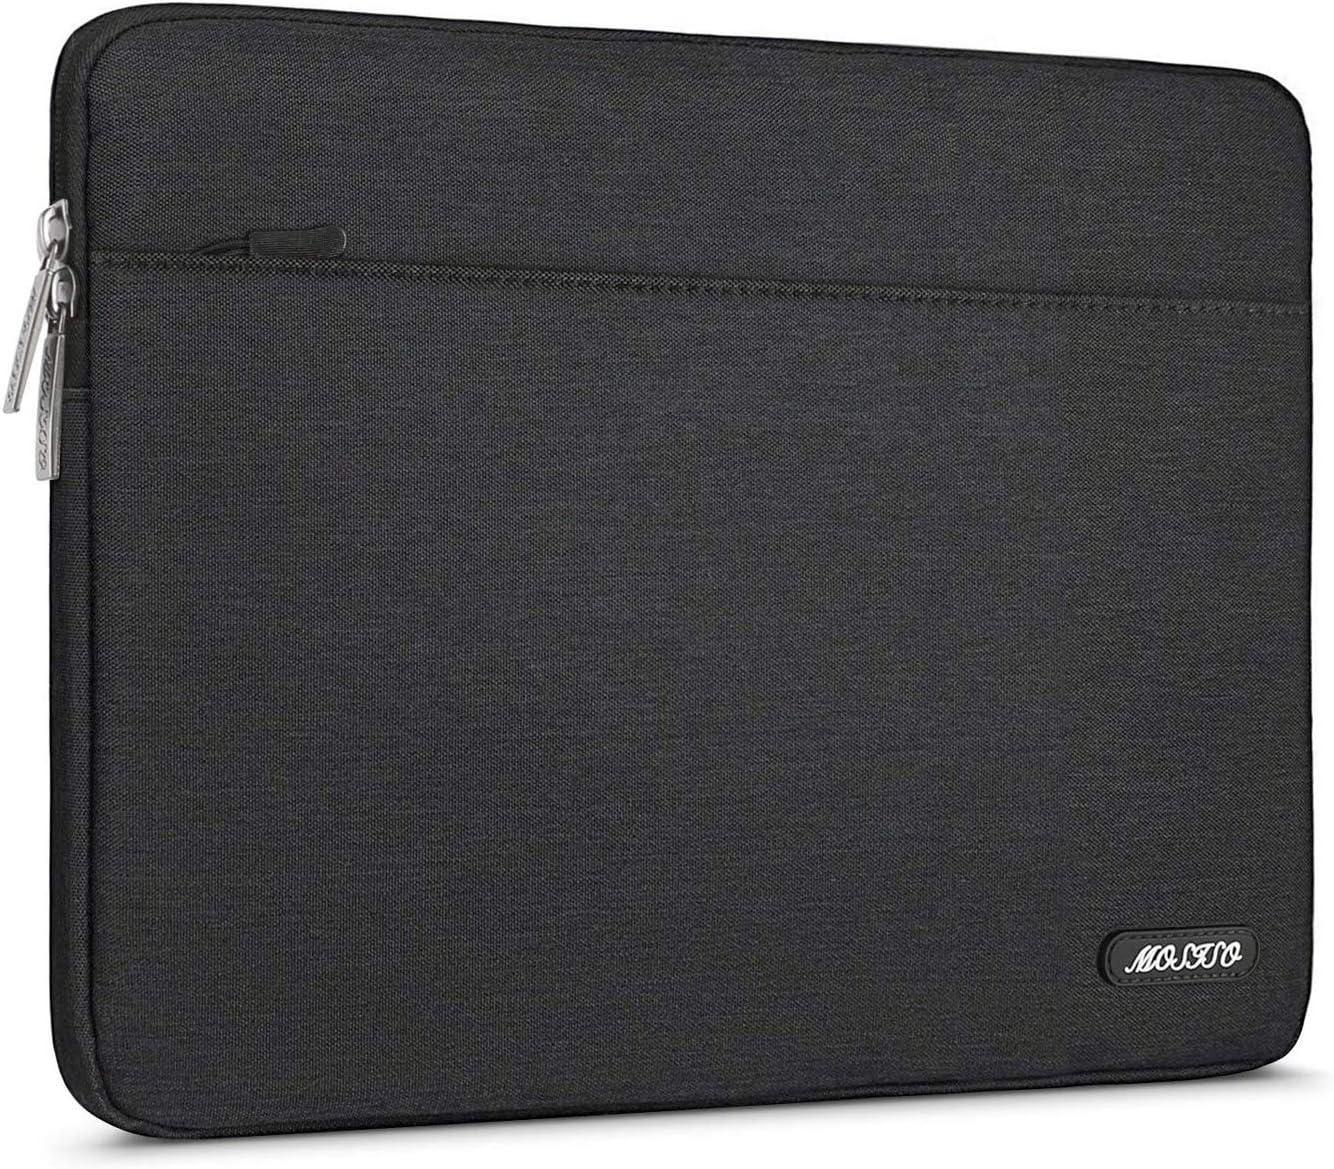 Grau MOSISO Tasche Sleeve H/ülle Kompatibel 13-13,3 Zoll MacBook Pro MacBook Air Notebook Polyester Gewebe sch/ützende Horizontal Laptoph/ülle Schutzh/ülle Laptoptasche Notebooktasche